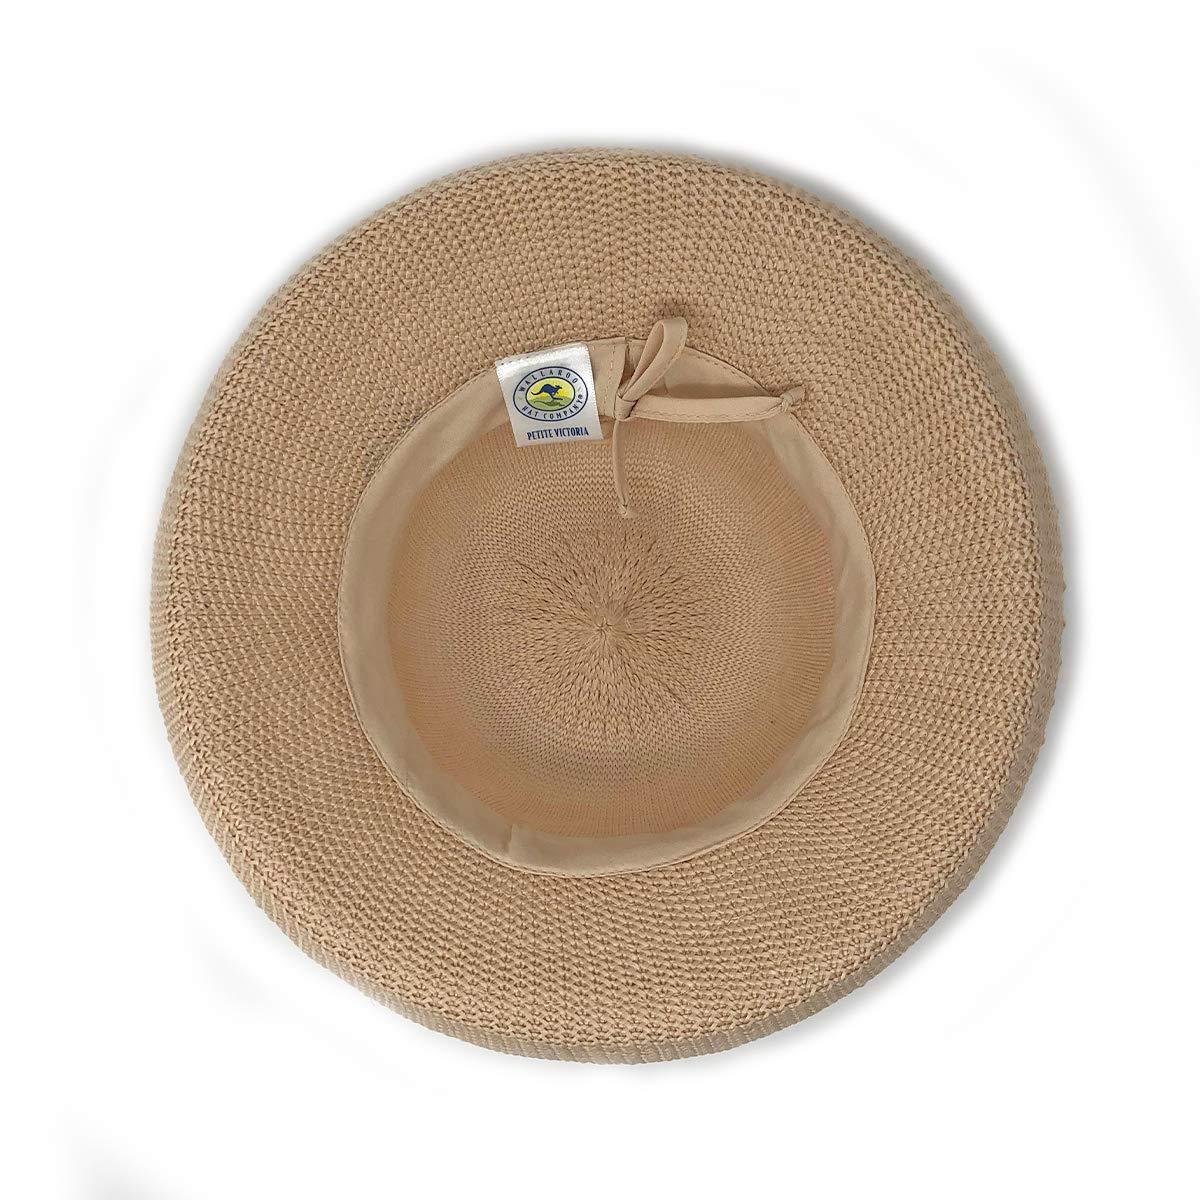 833edc956bf Wallaroo Hat Company Women s Petite Victoria Sun Hat - Perfect for Smaller  Heads - Tan